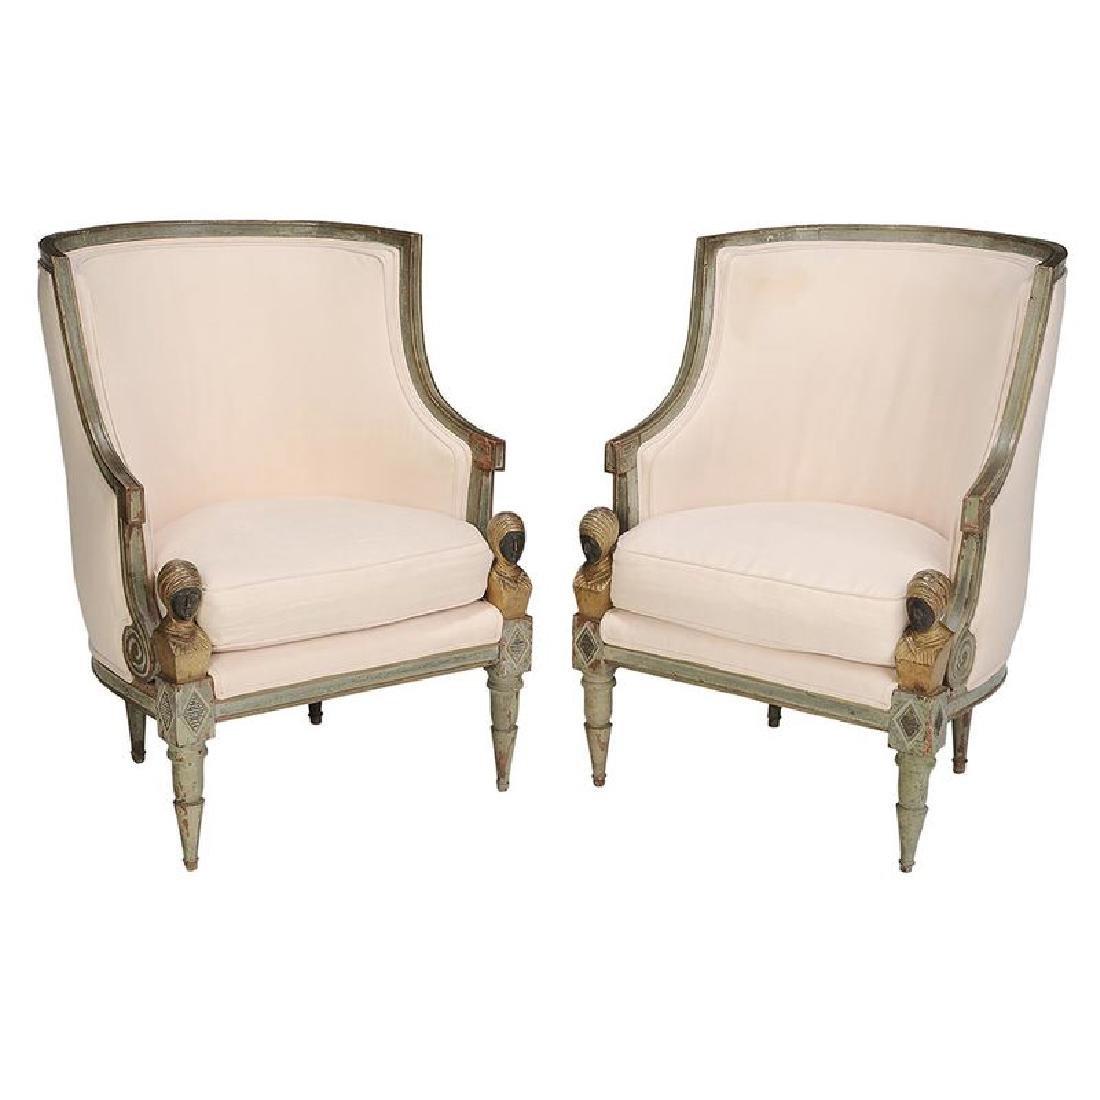 Pair Italian Neoclassical Arm Chairs